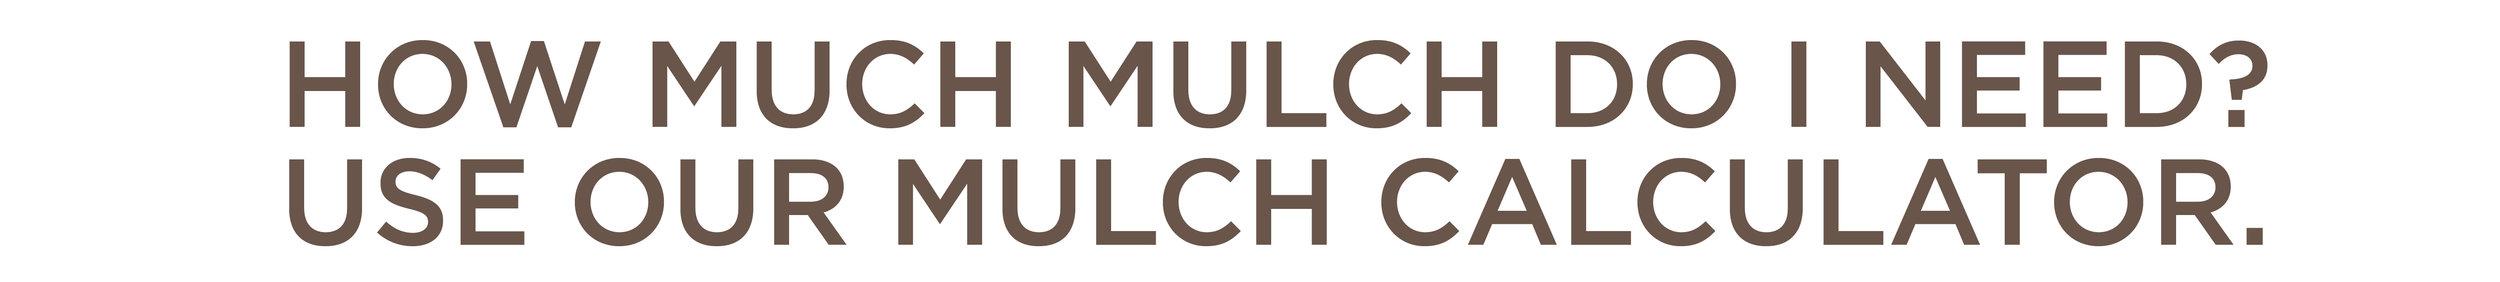 Calculate mulch delivery by the scoop (4 scoop minimum) online mulch calculator